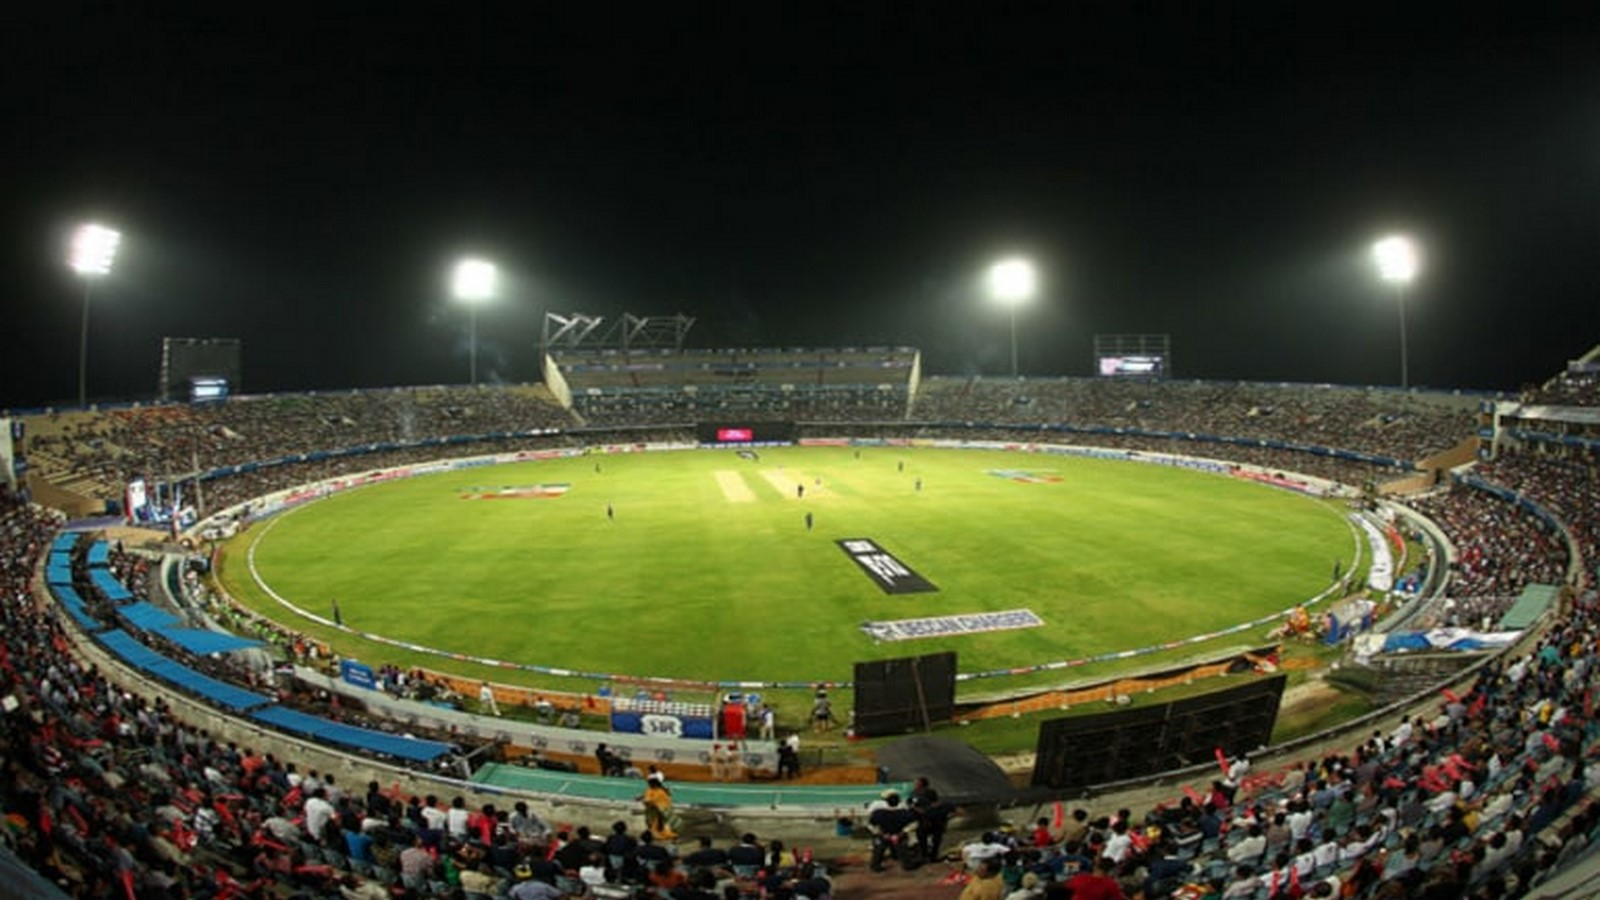 Rajiv Gandhi International Cricket Stadium by Shashi Prabhu: One of India's most popular cricket stadiums - Sheet6